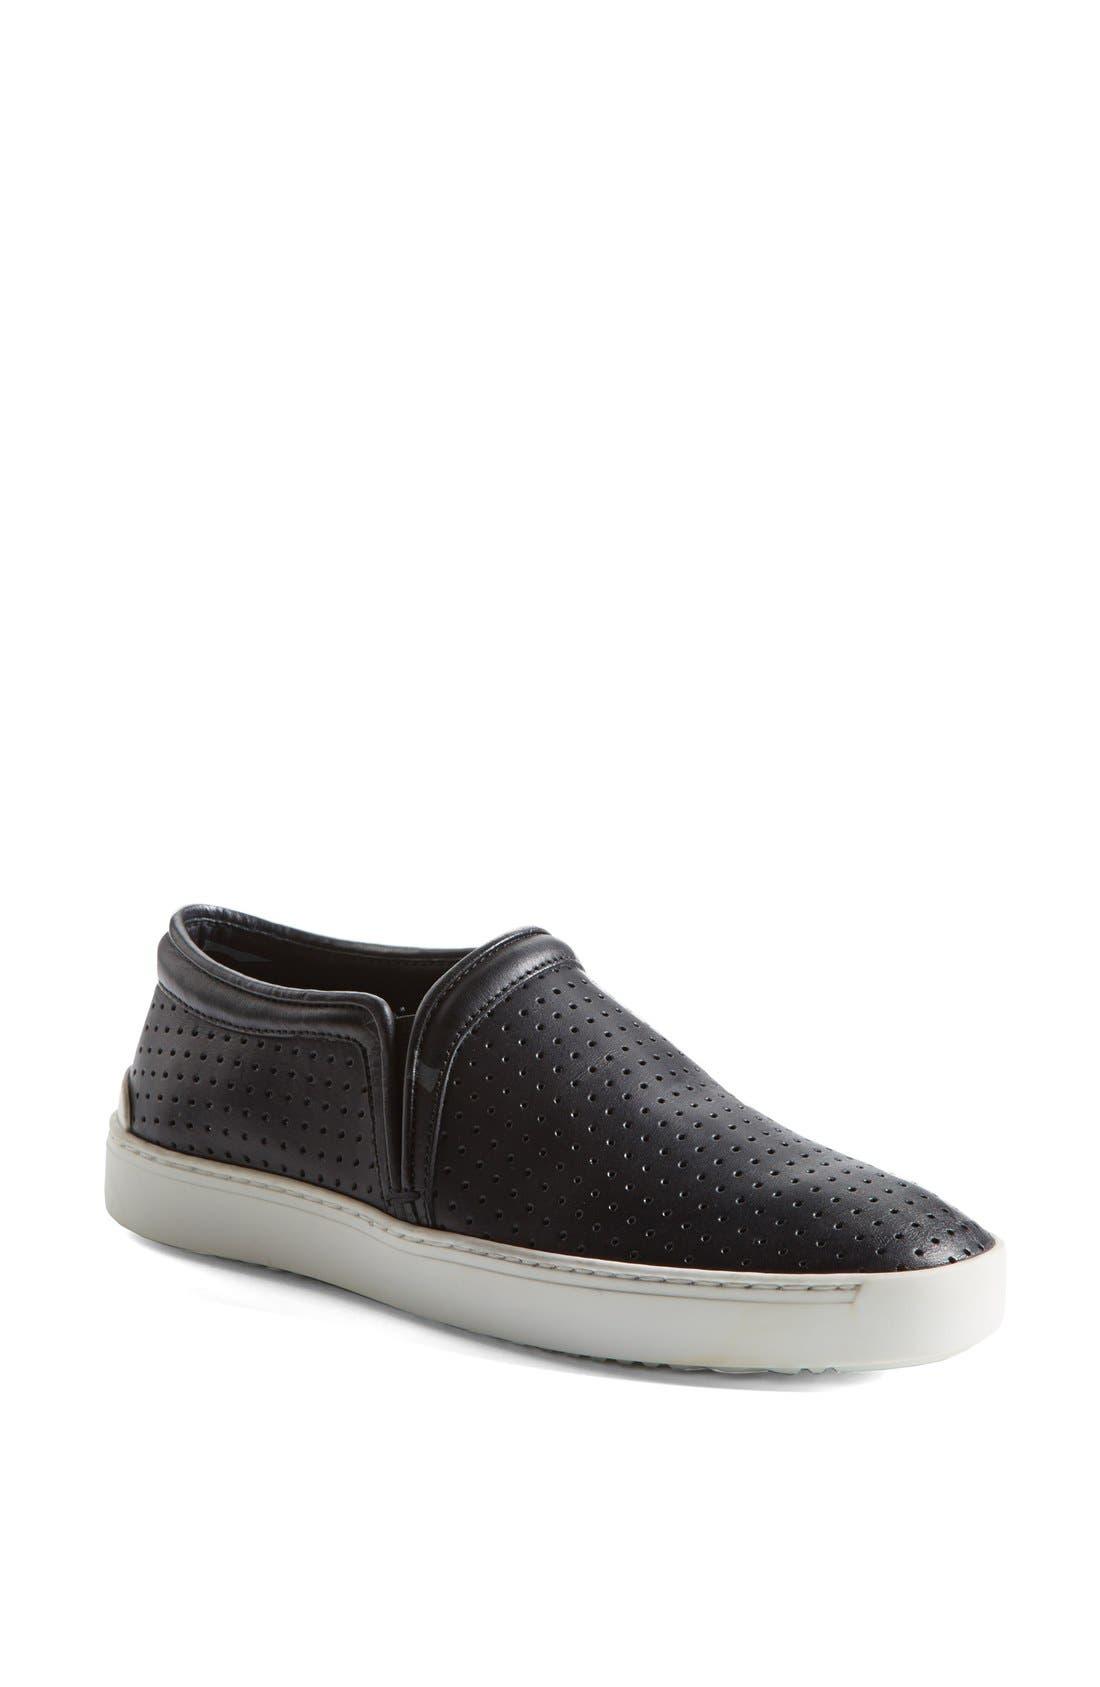 Main Image - rag & bone 'Kent' Perforated Leather Slip-On